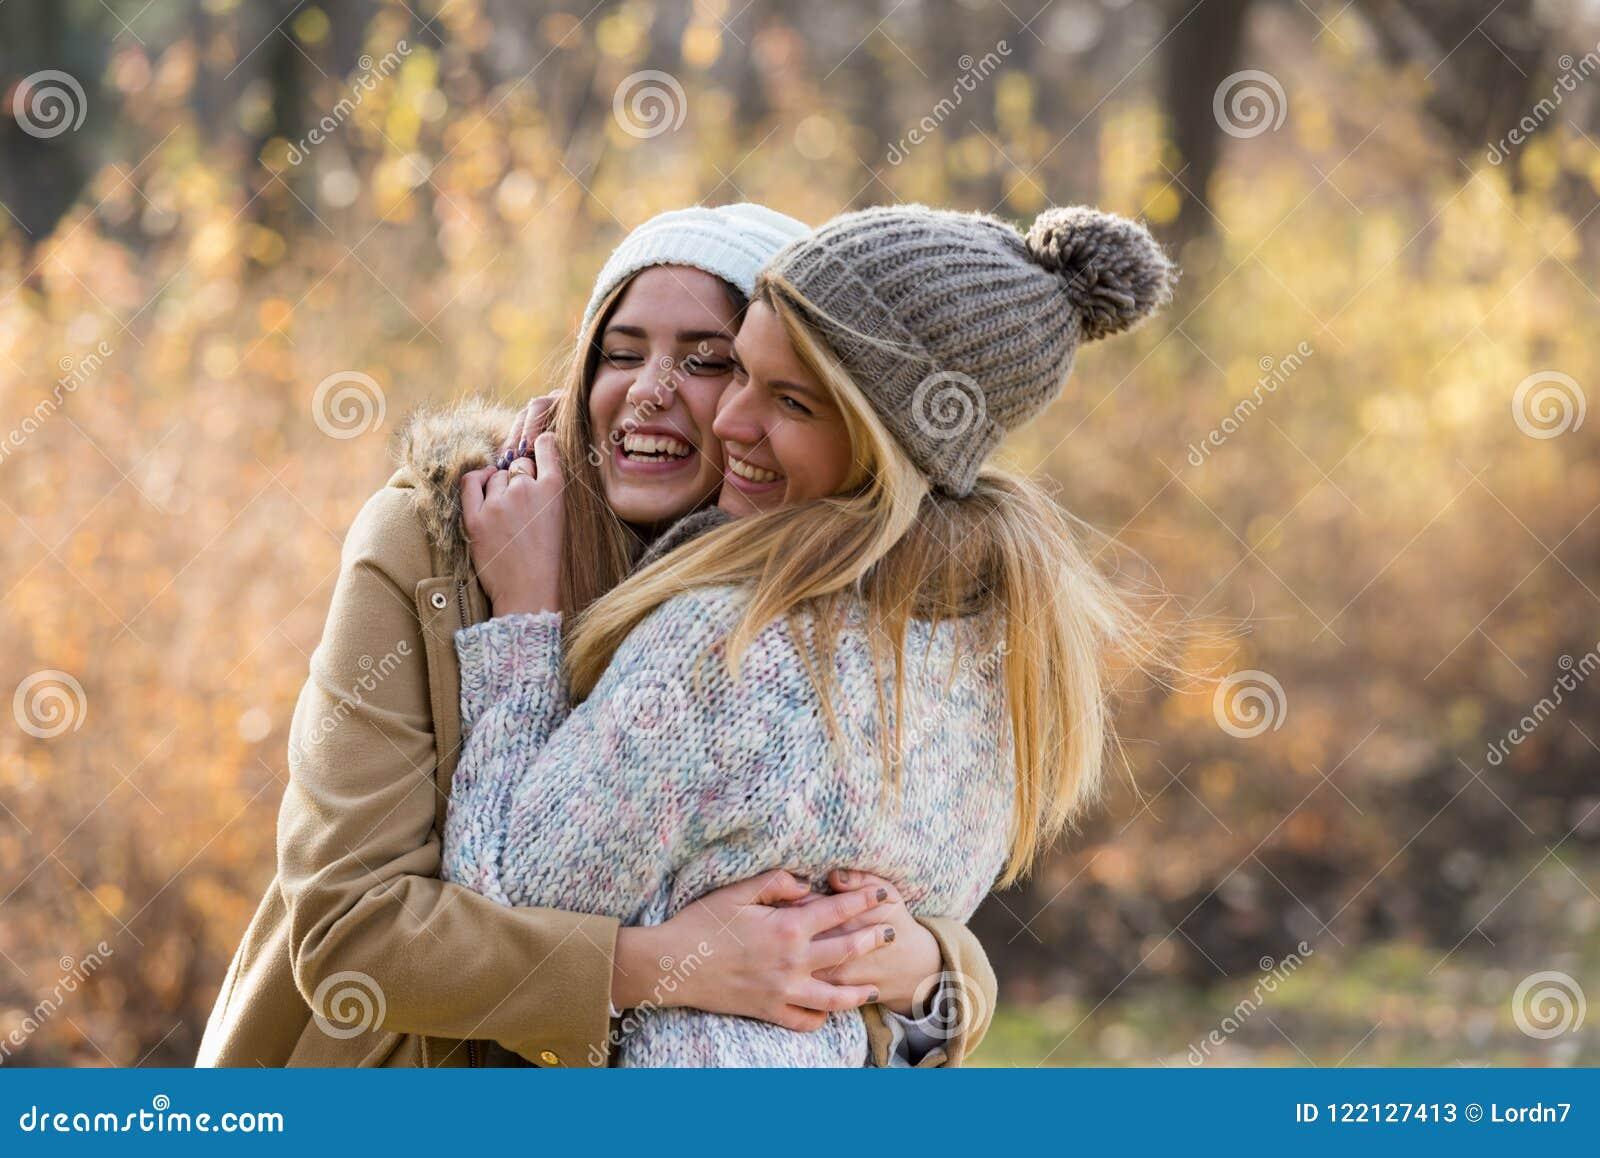 Two Beautiful Girls Hugging Friendship Stock Image Image Of Beautiful Smiling 122127413